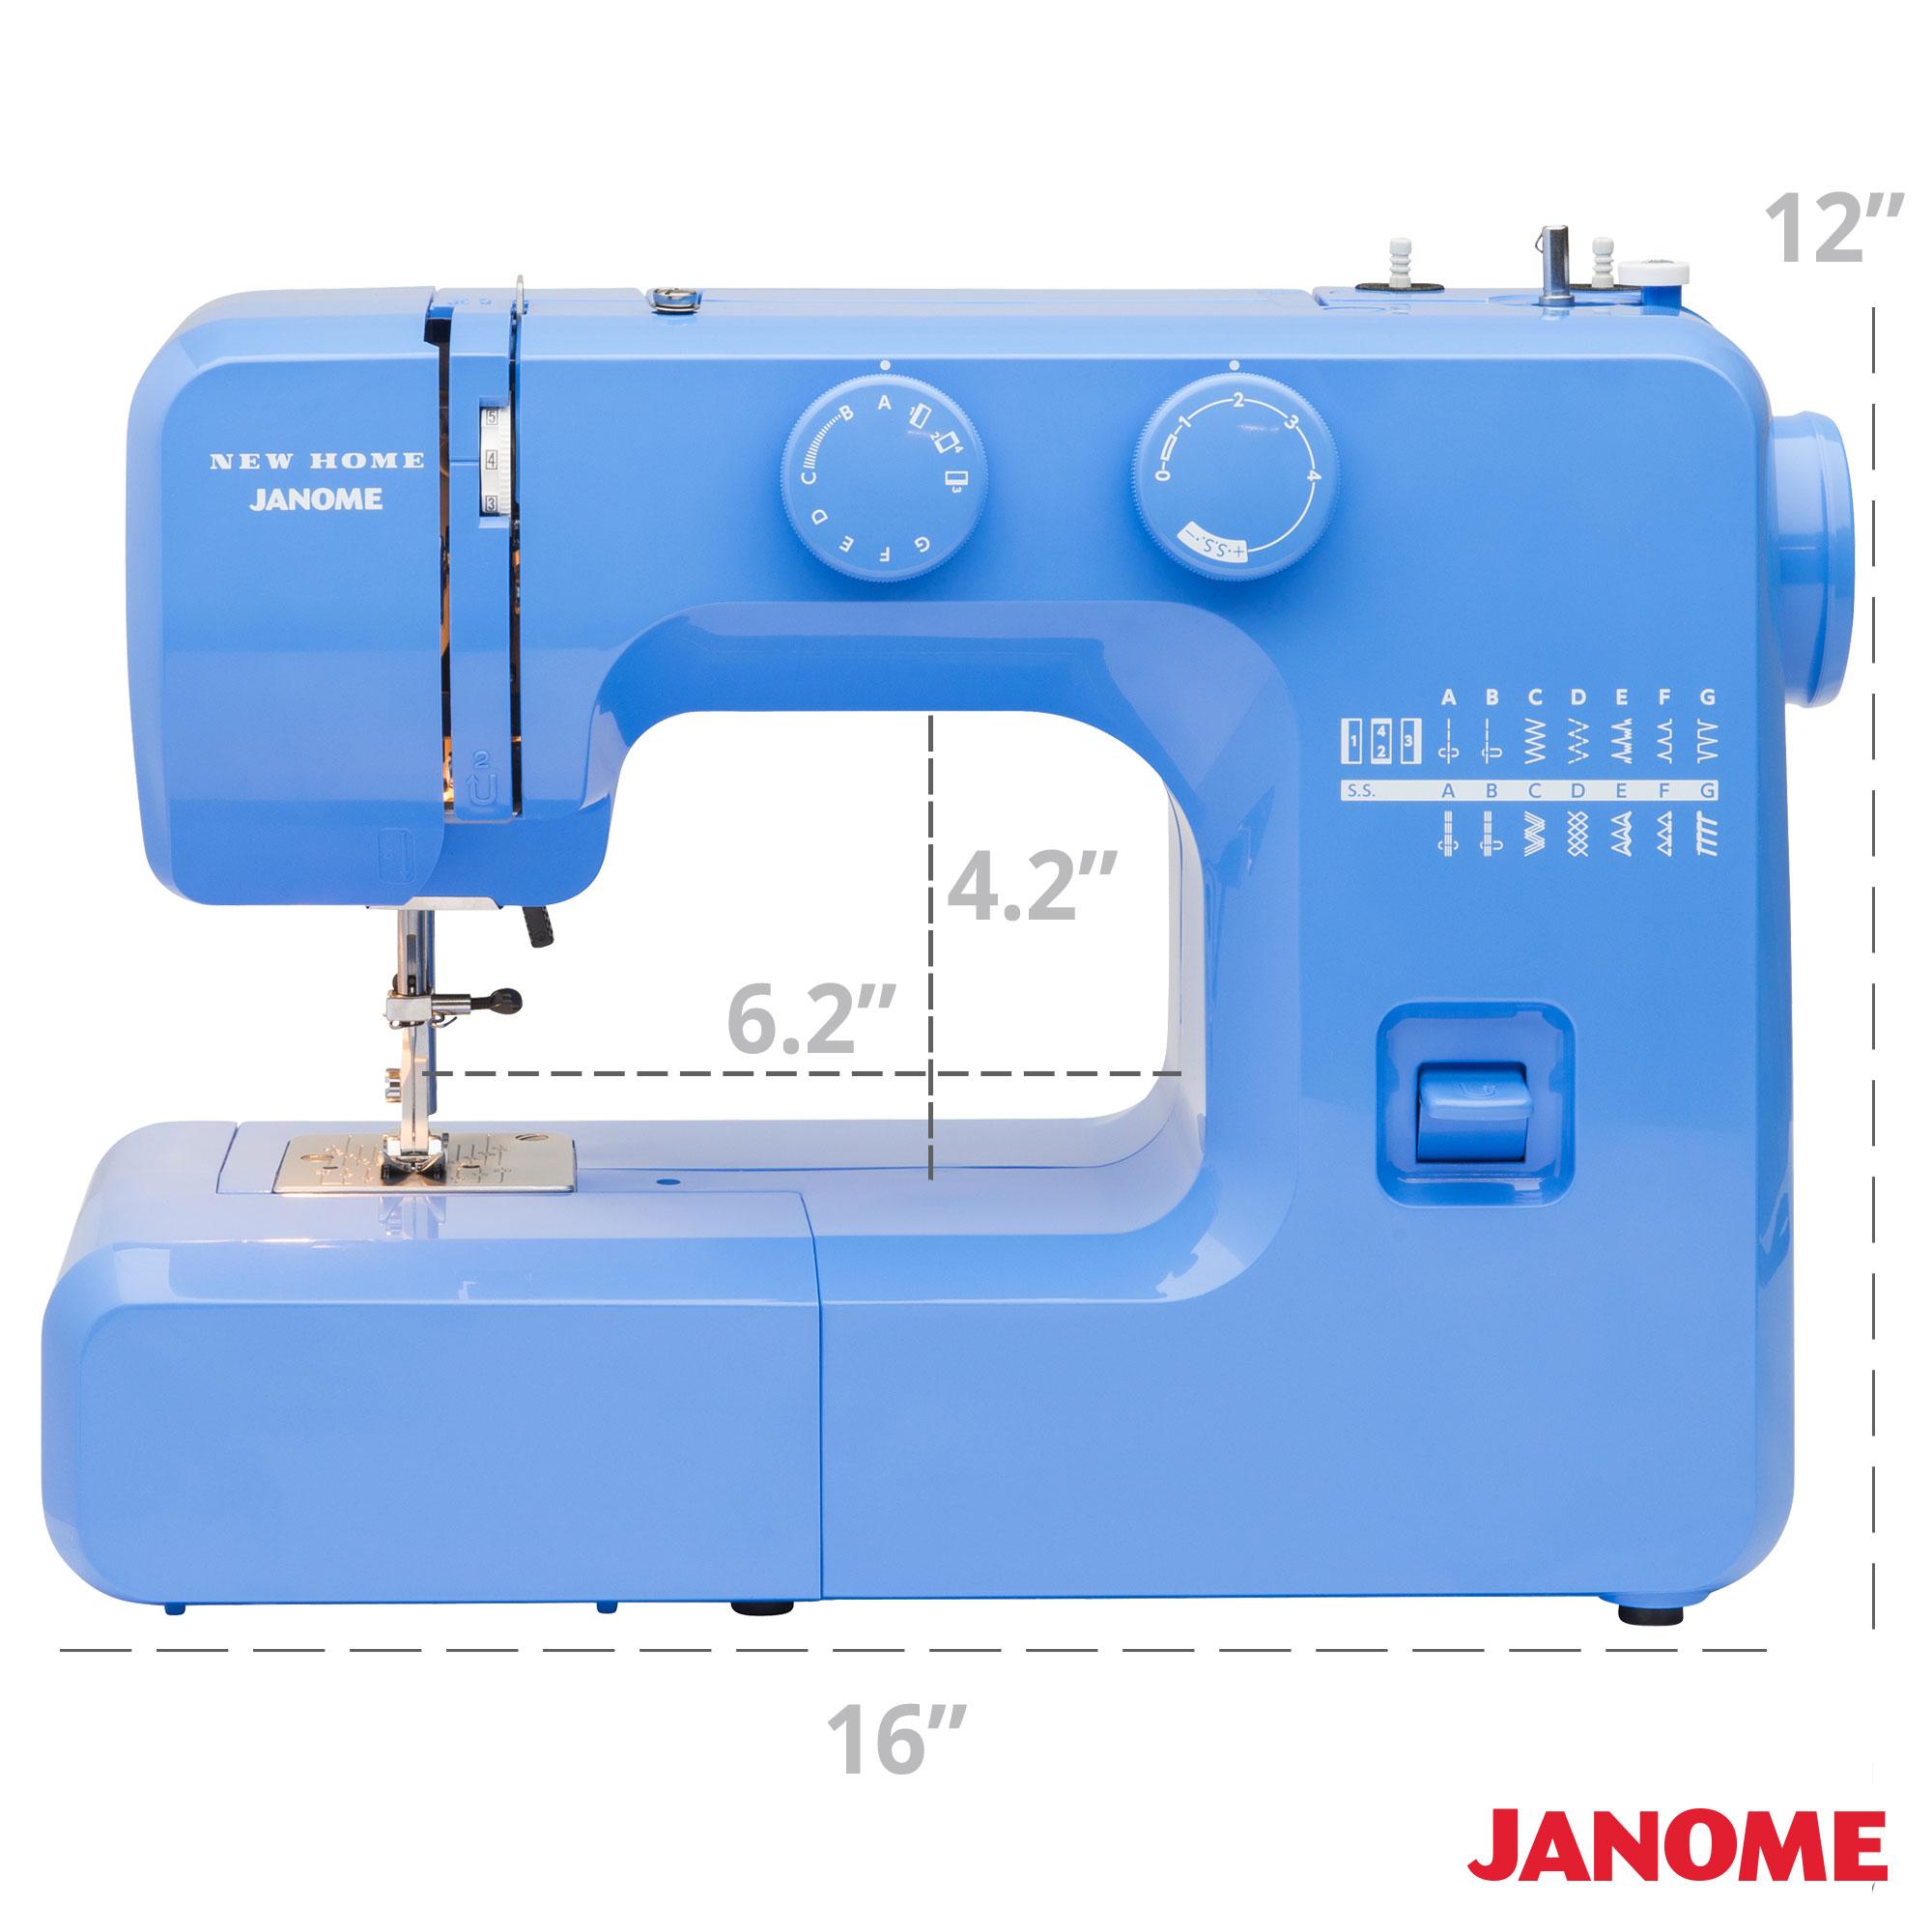 com computerized machine walmart janome sewing ip quilt stitch mod quilting